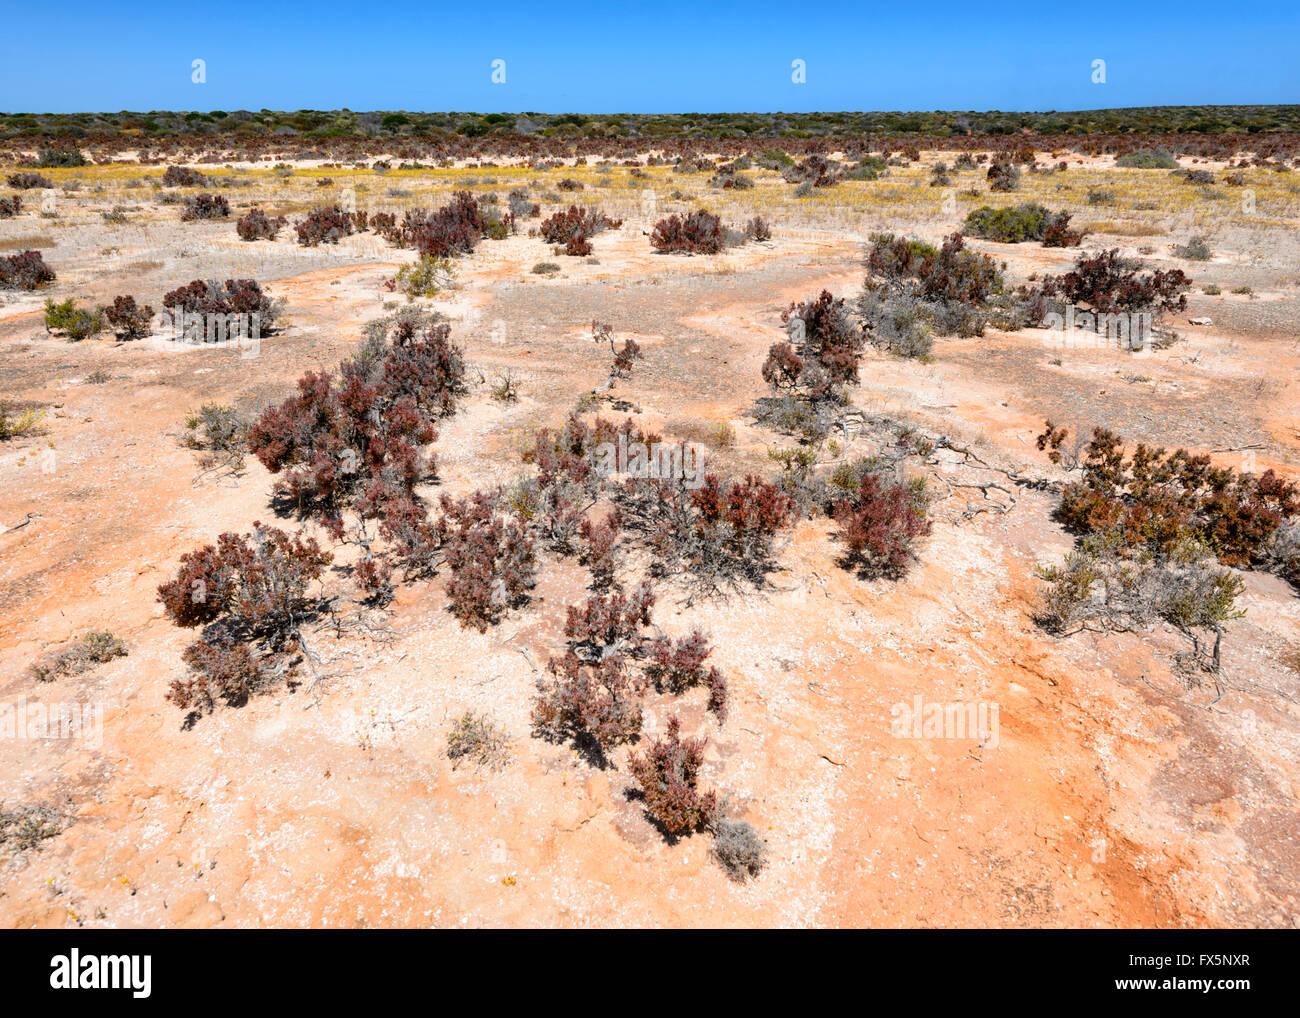 Vegetation of the North West Coast of Western Australia, Australia - Stock Image